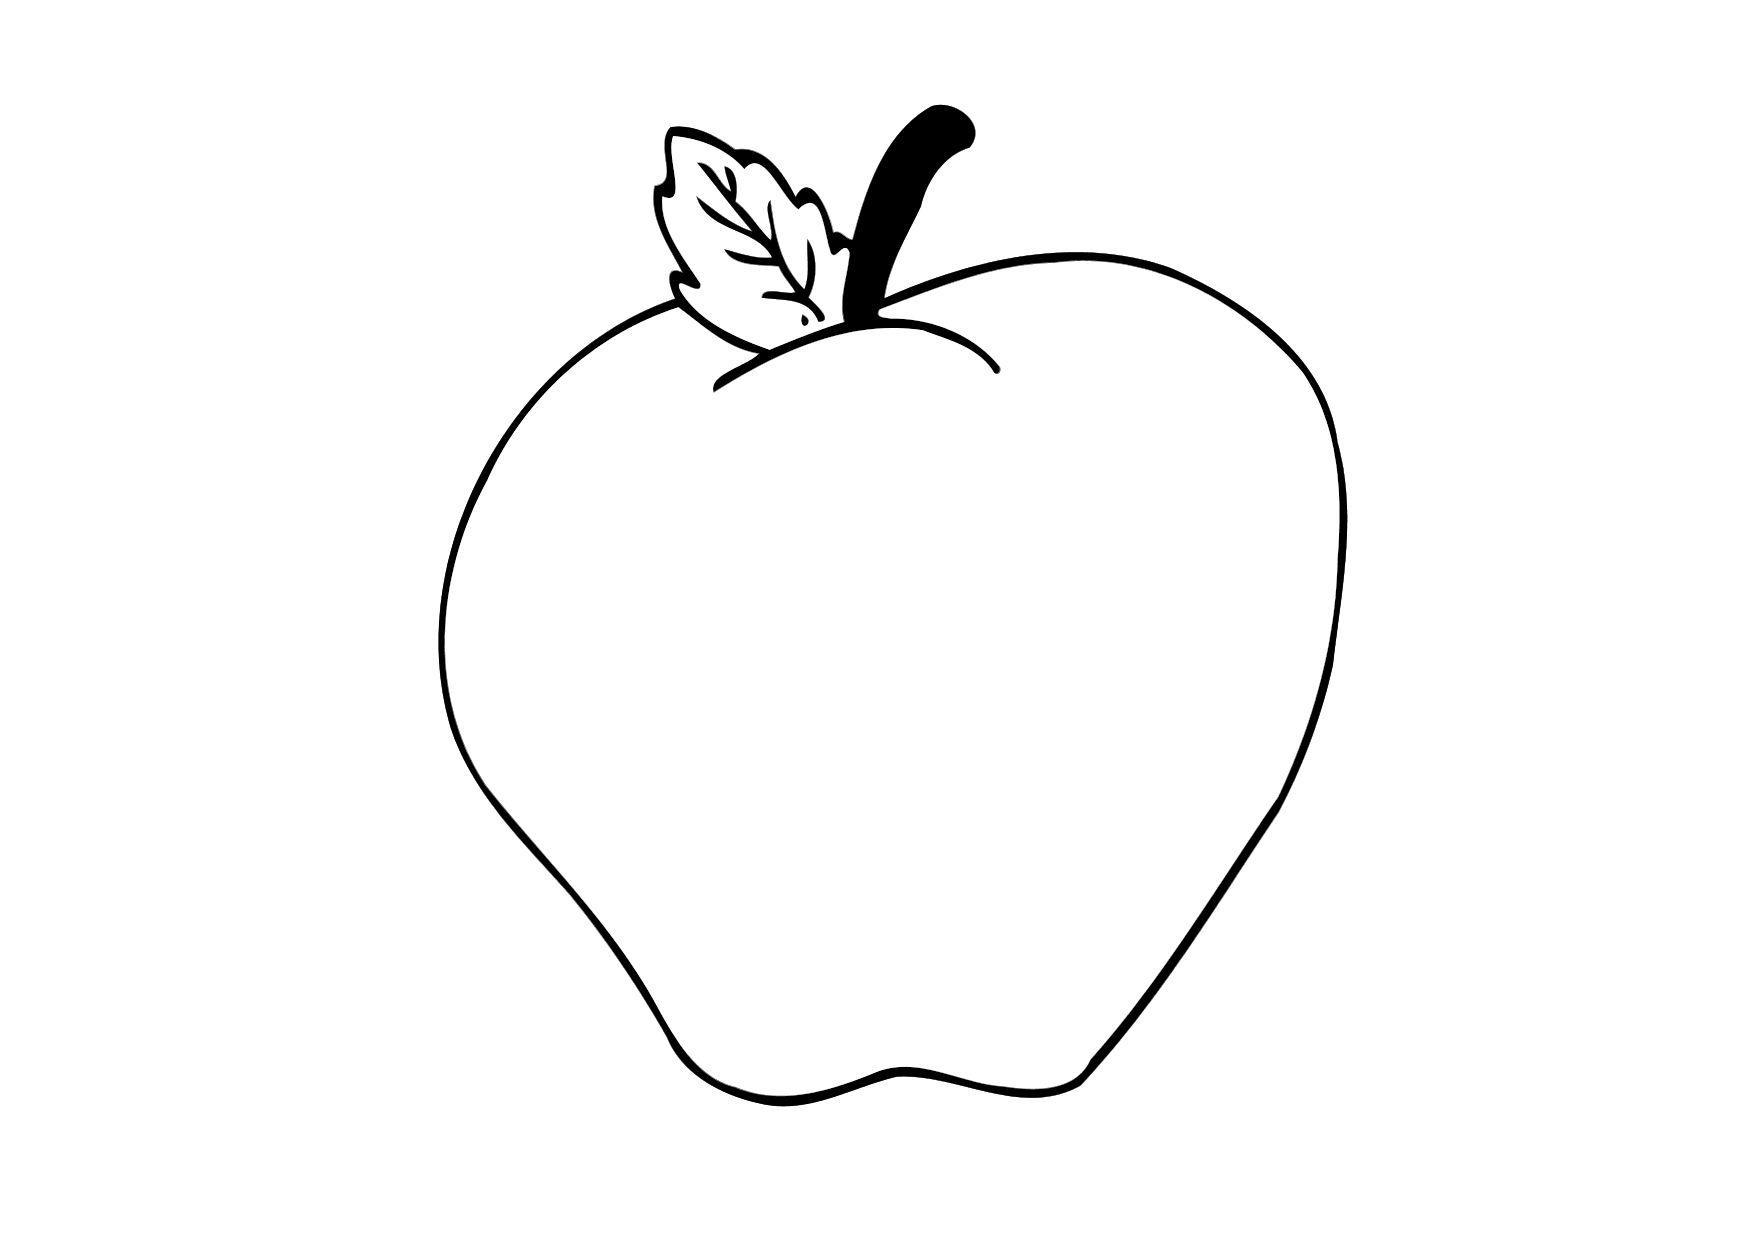 Coloriage pomme img 12305 - Dessin pomme apple ...